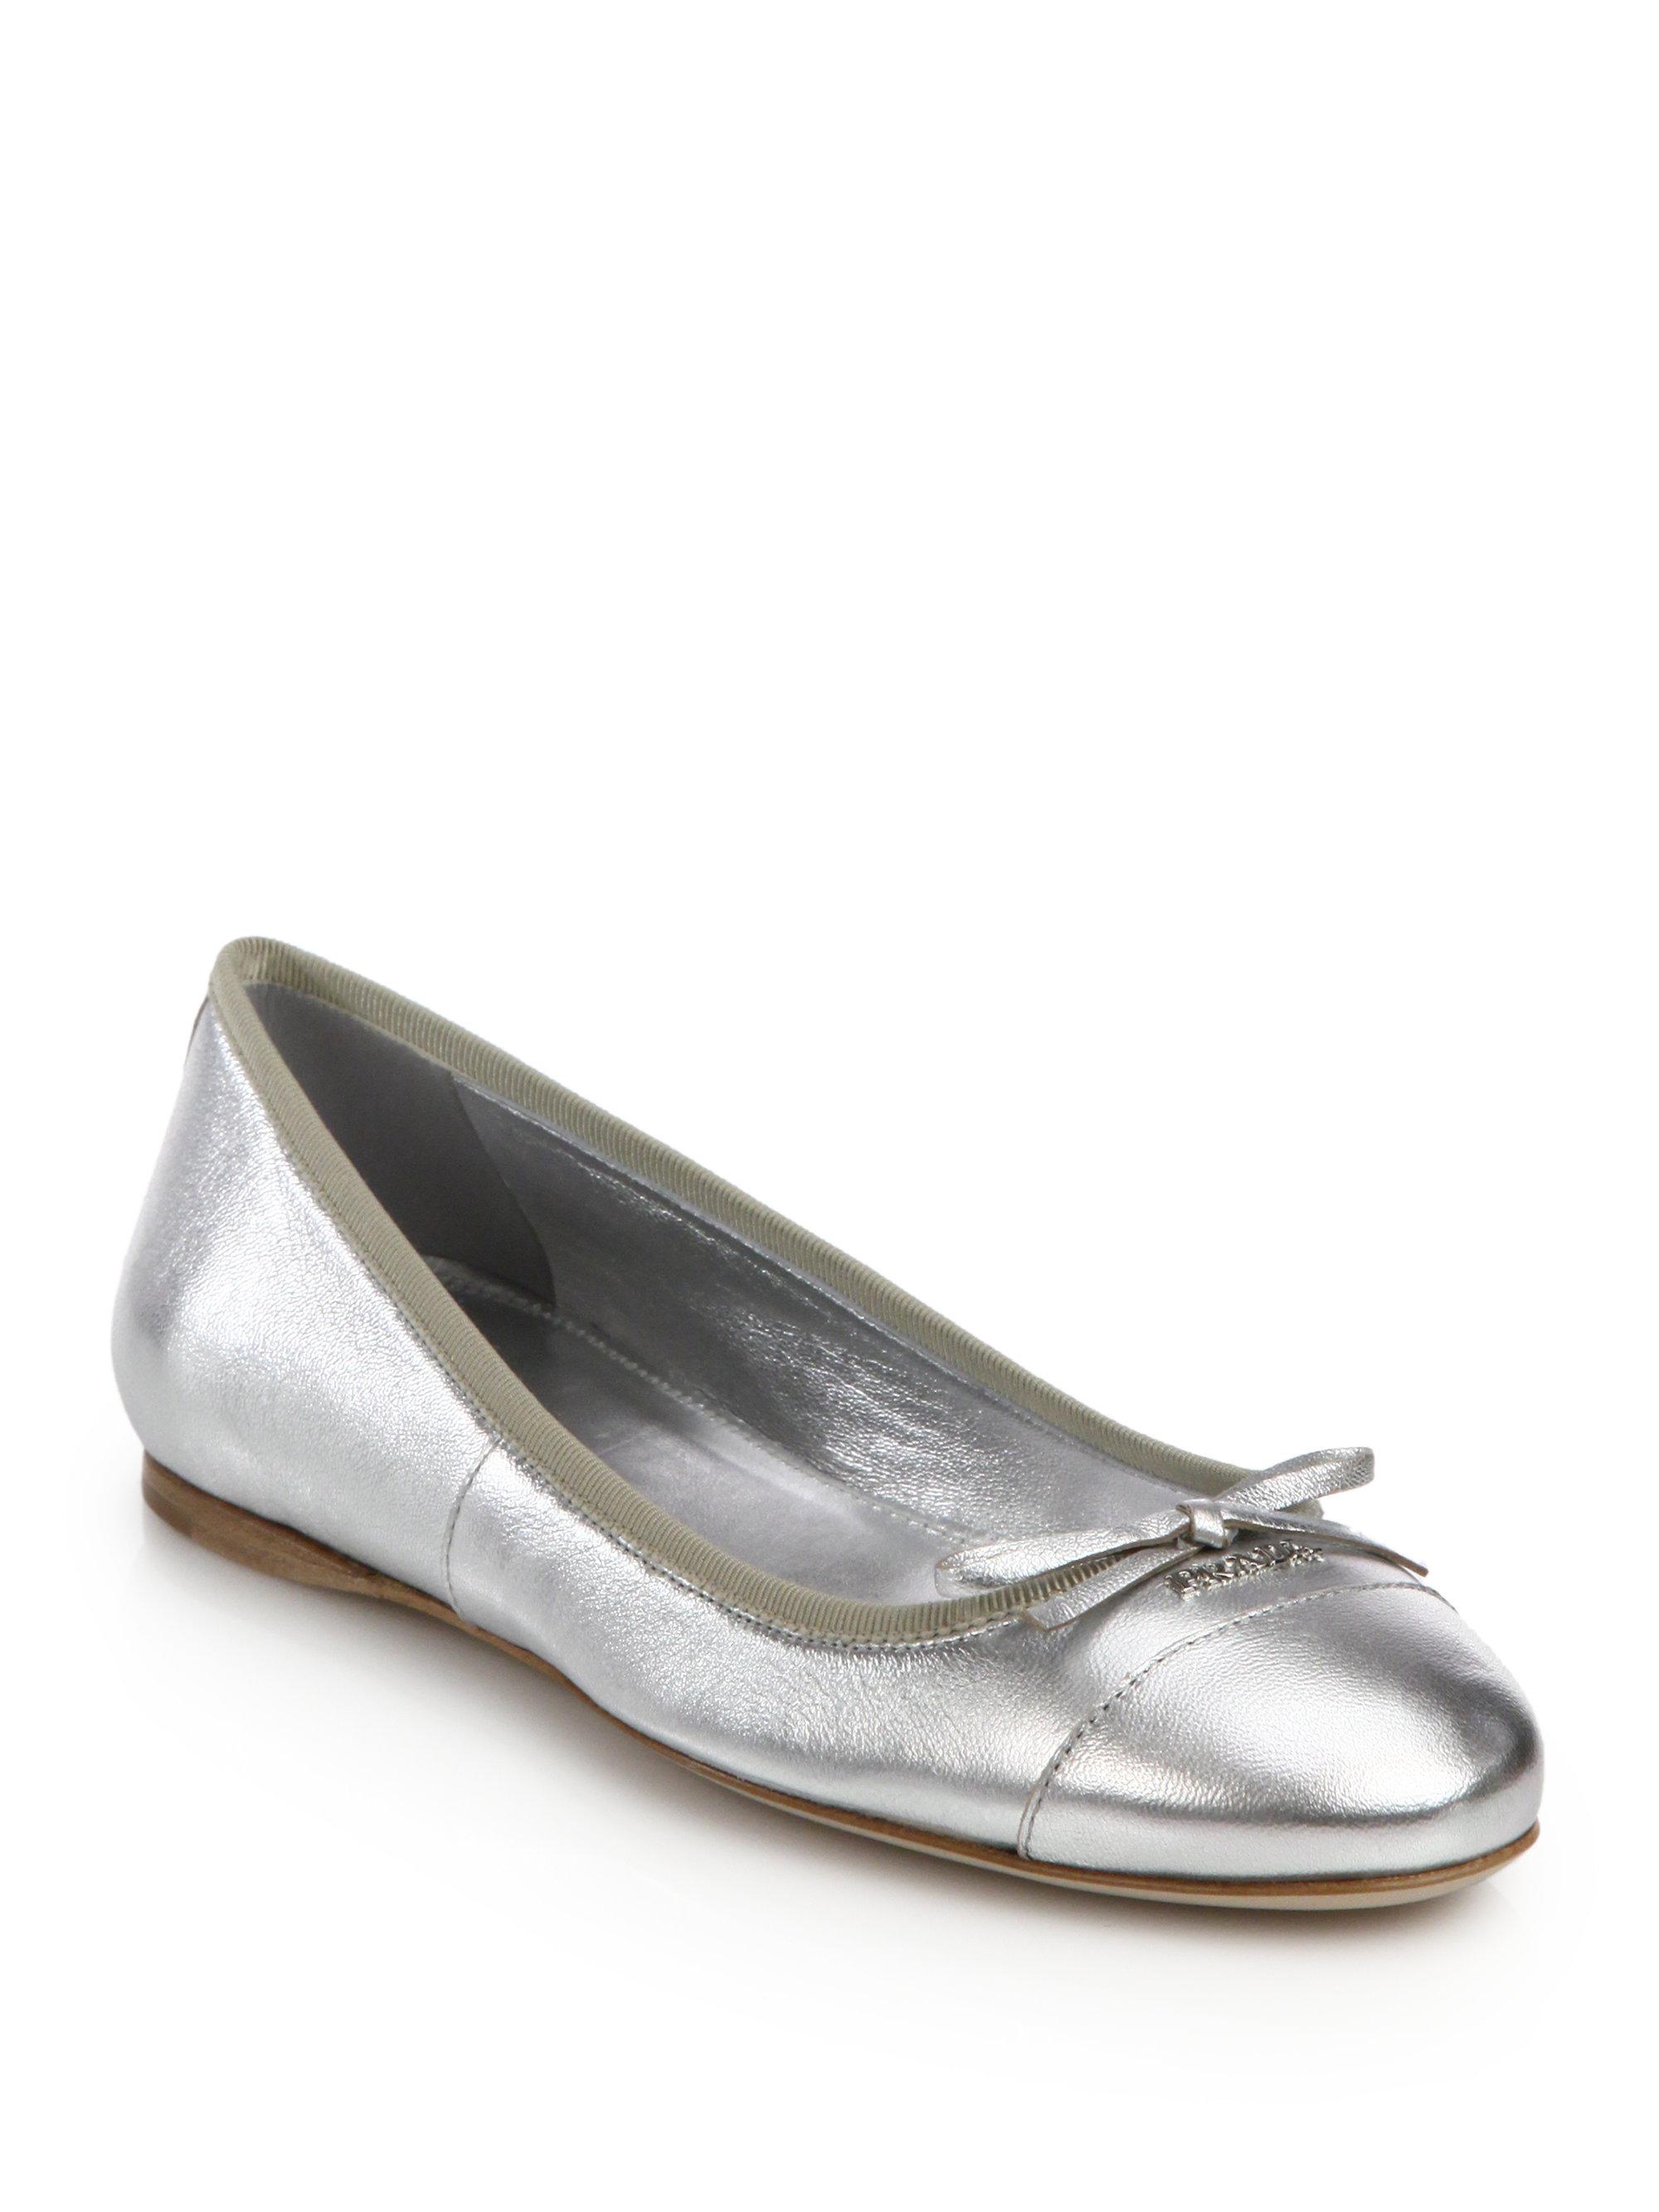 prada metallic leather ballet flats in silver lyst